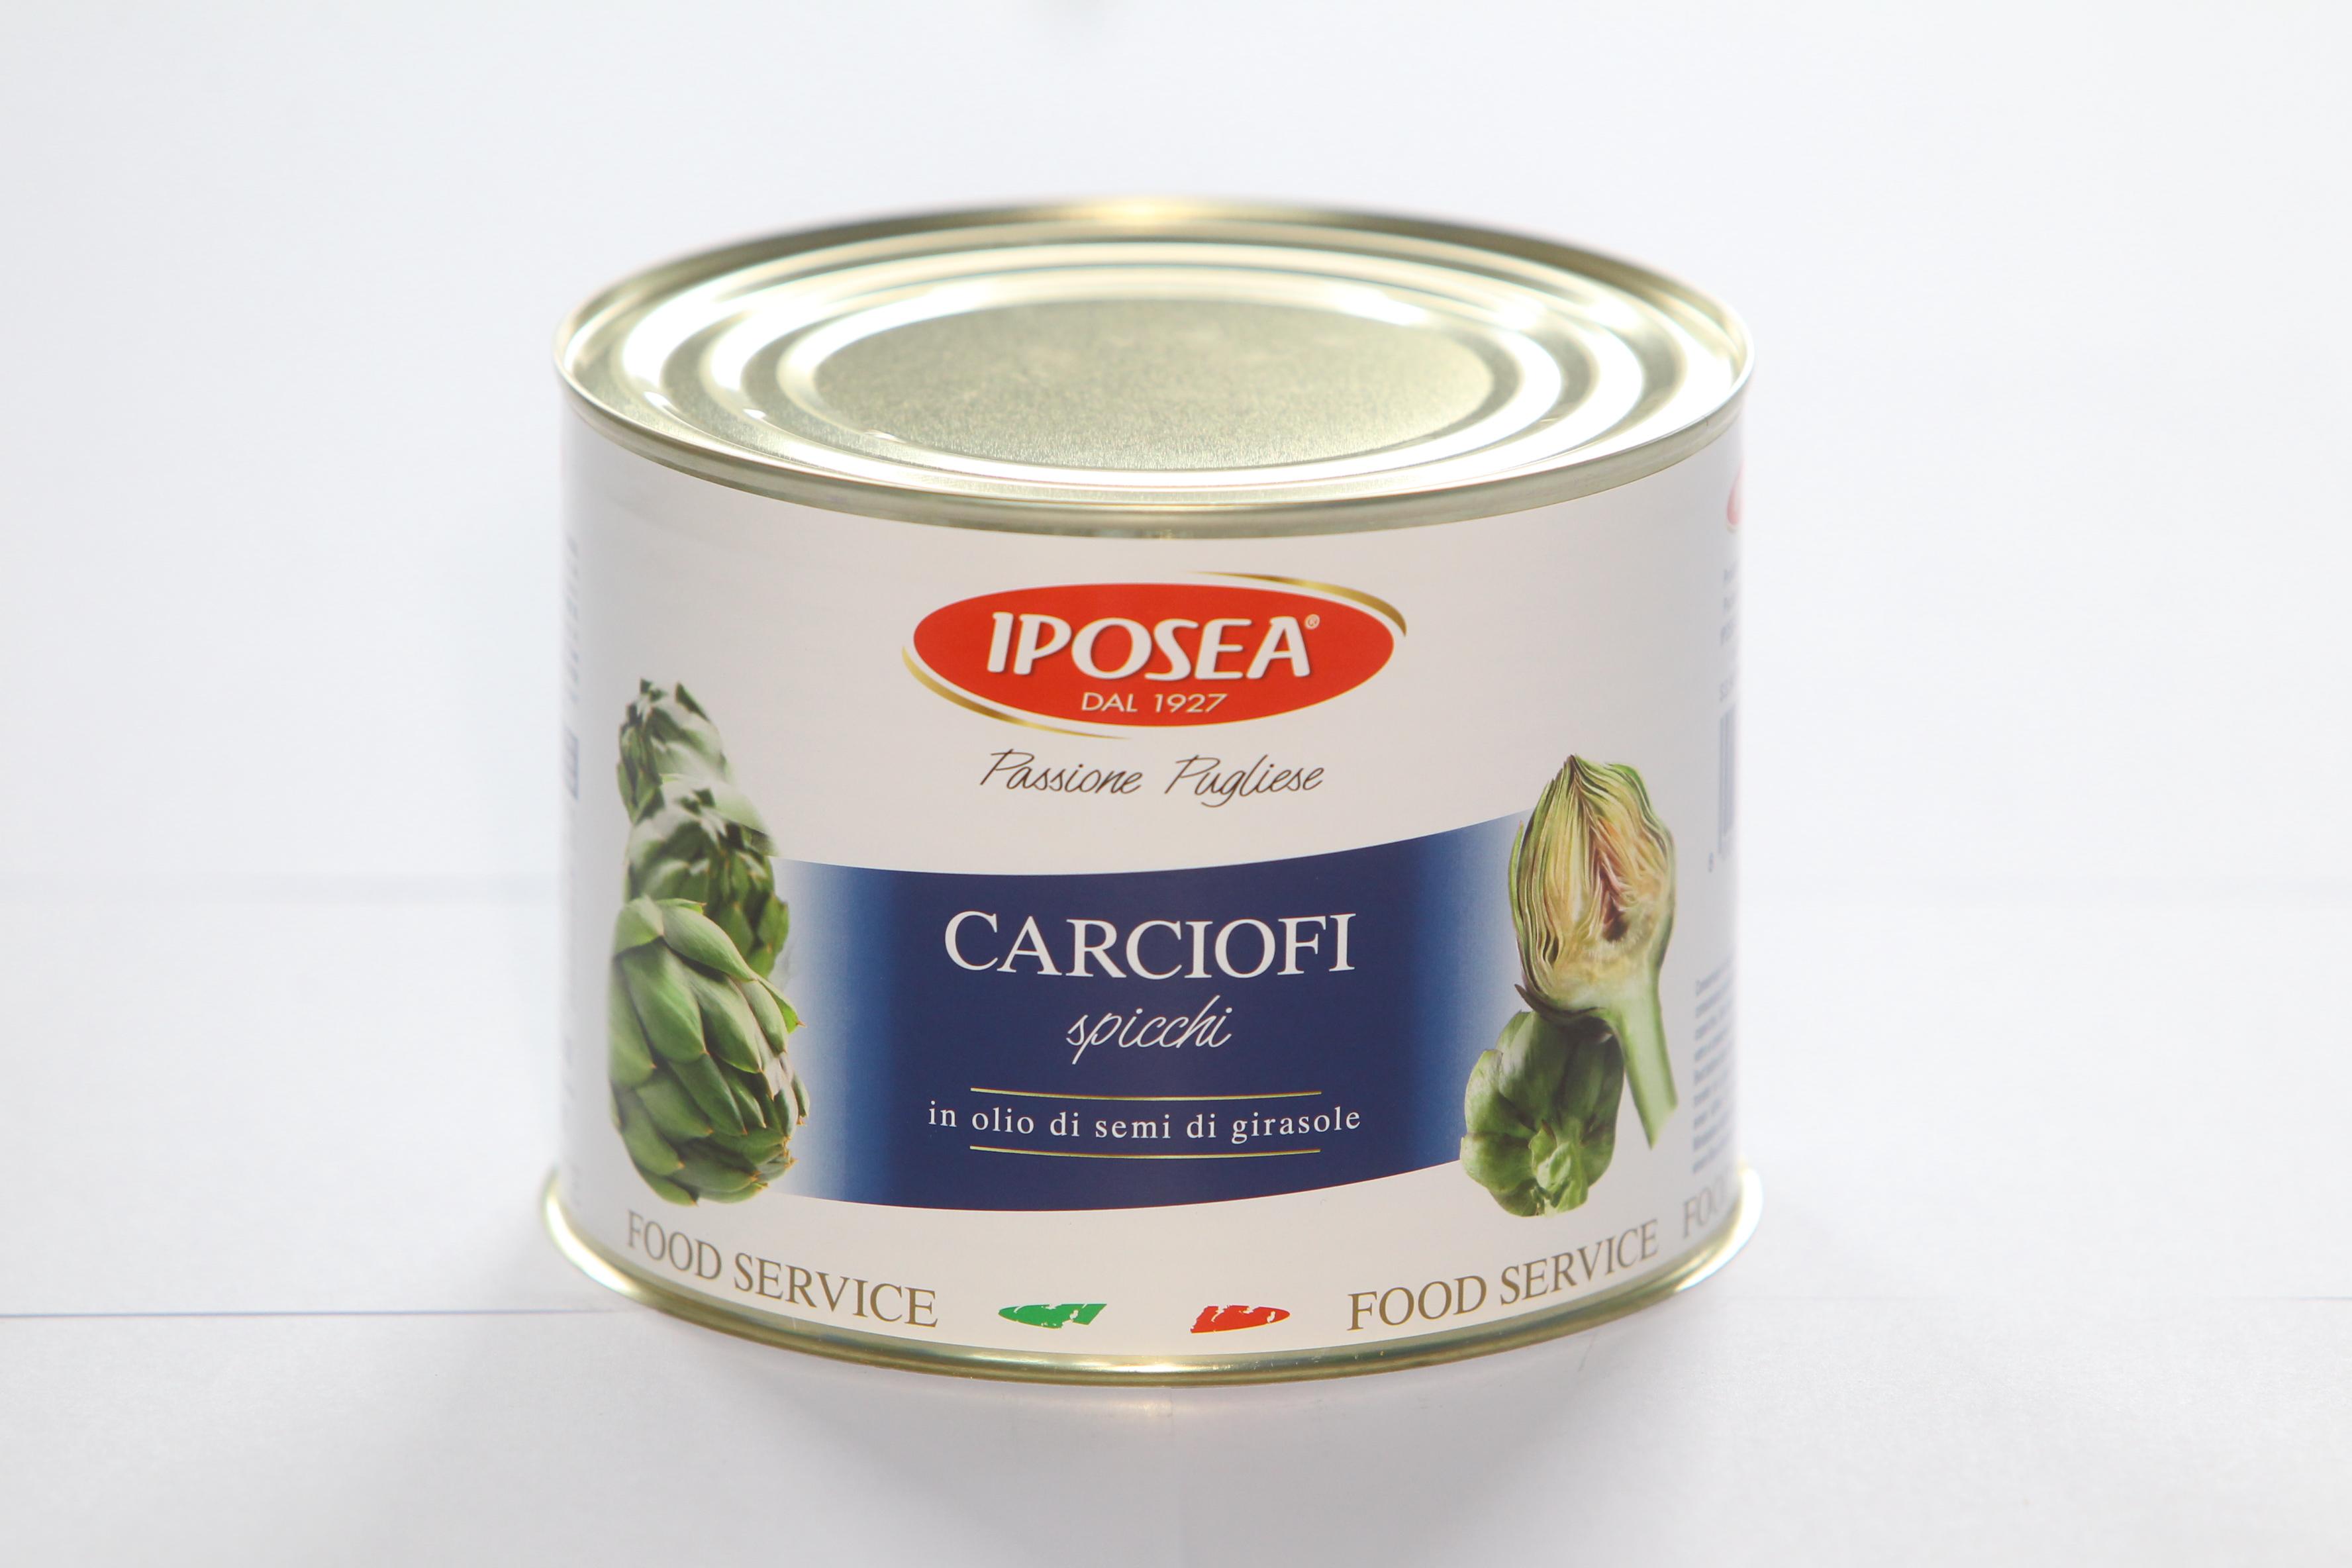 CARCIOFI A SPICCHI SOTTOLIO DA 2,2 KG